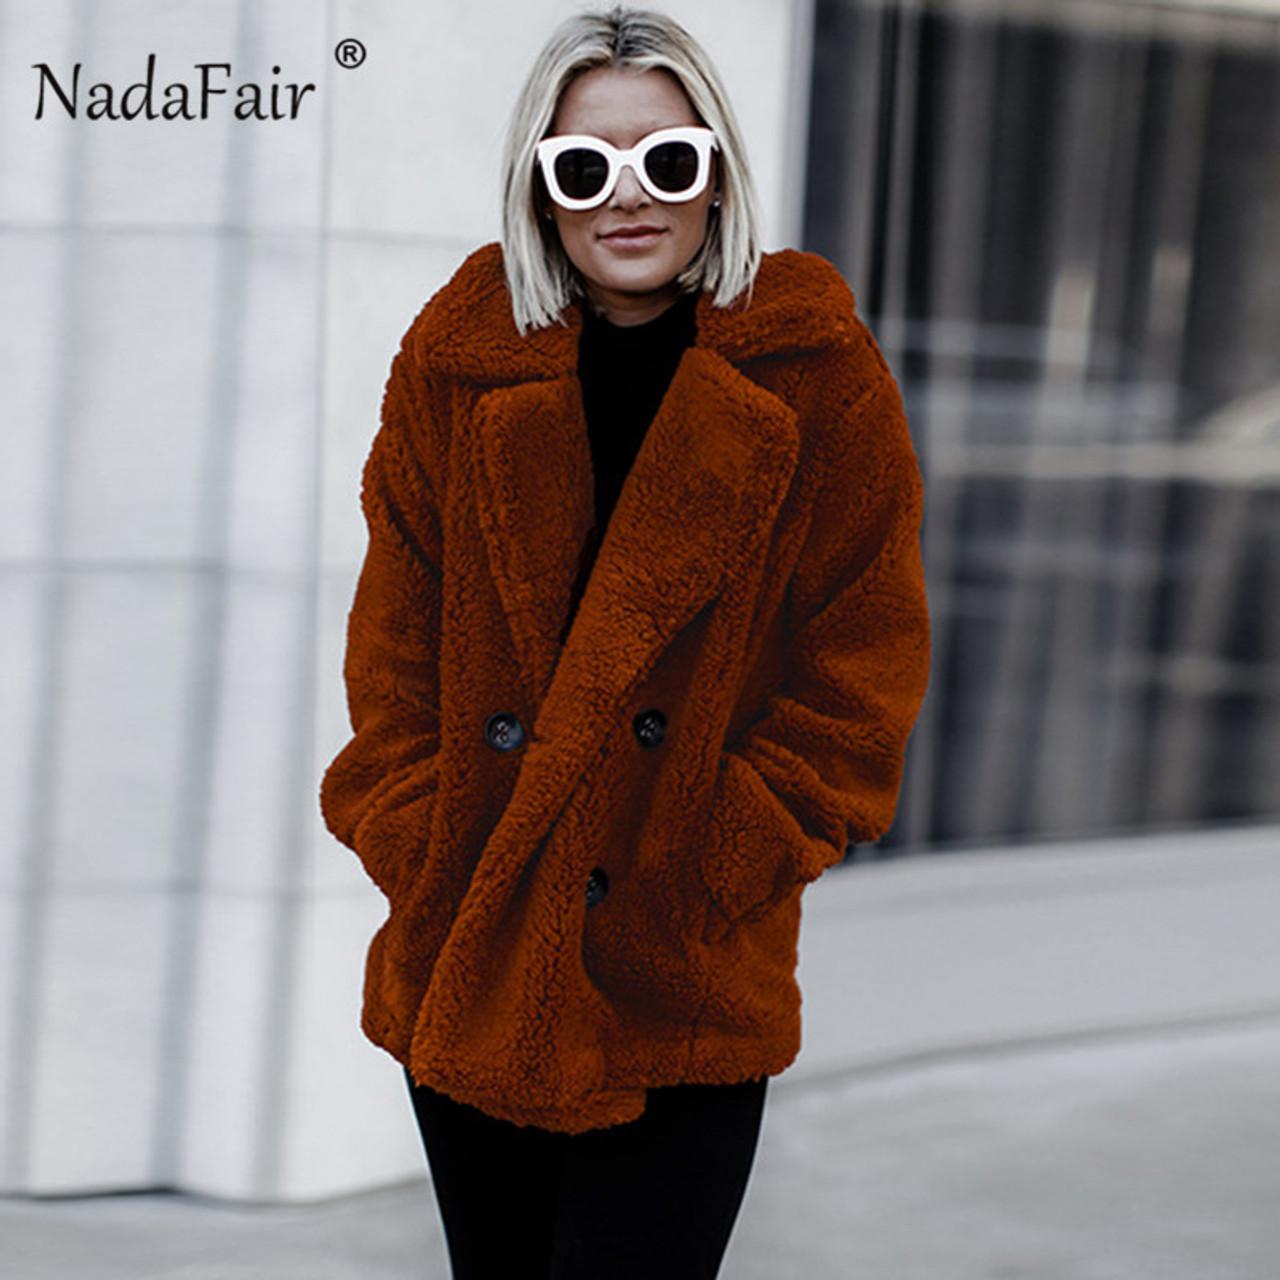 c8264102c3b ... Nadafair plus size fleece faux fur jacket coat women winter pockets  thick teddy coat female soft ...